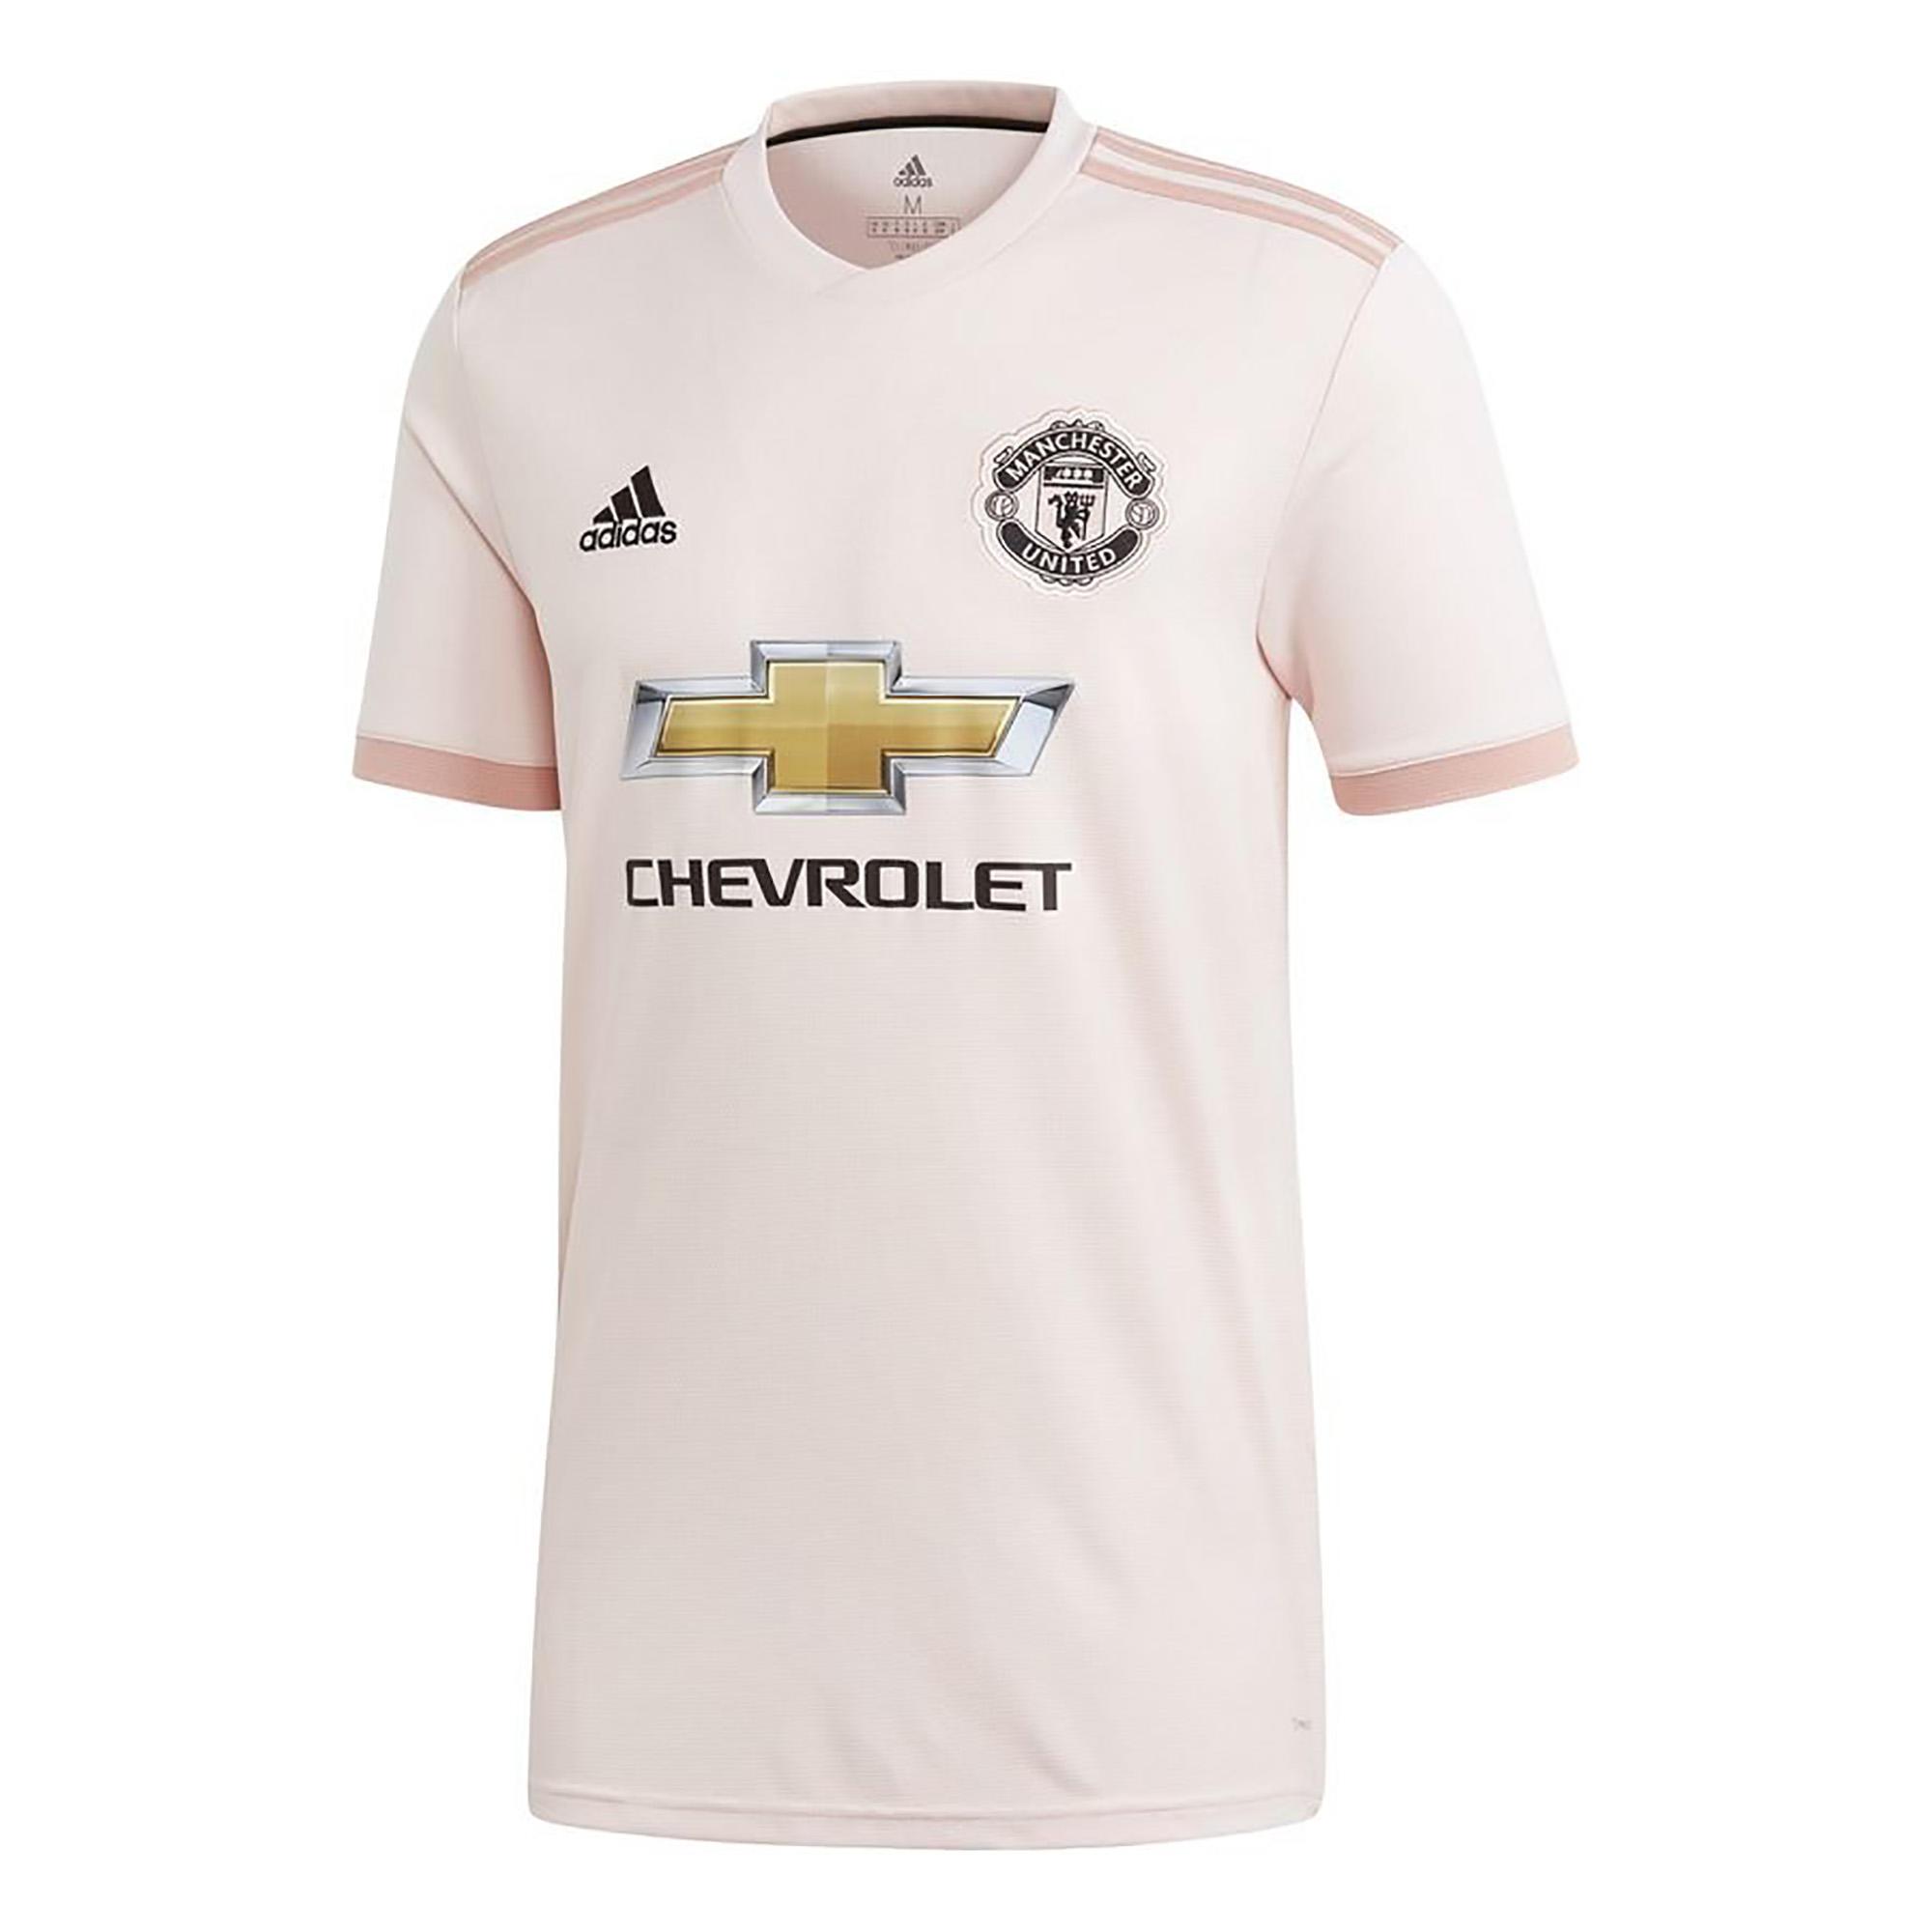 72d1e2232c Camisetas Oficiales Premier League Inglesa 2018 19